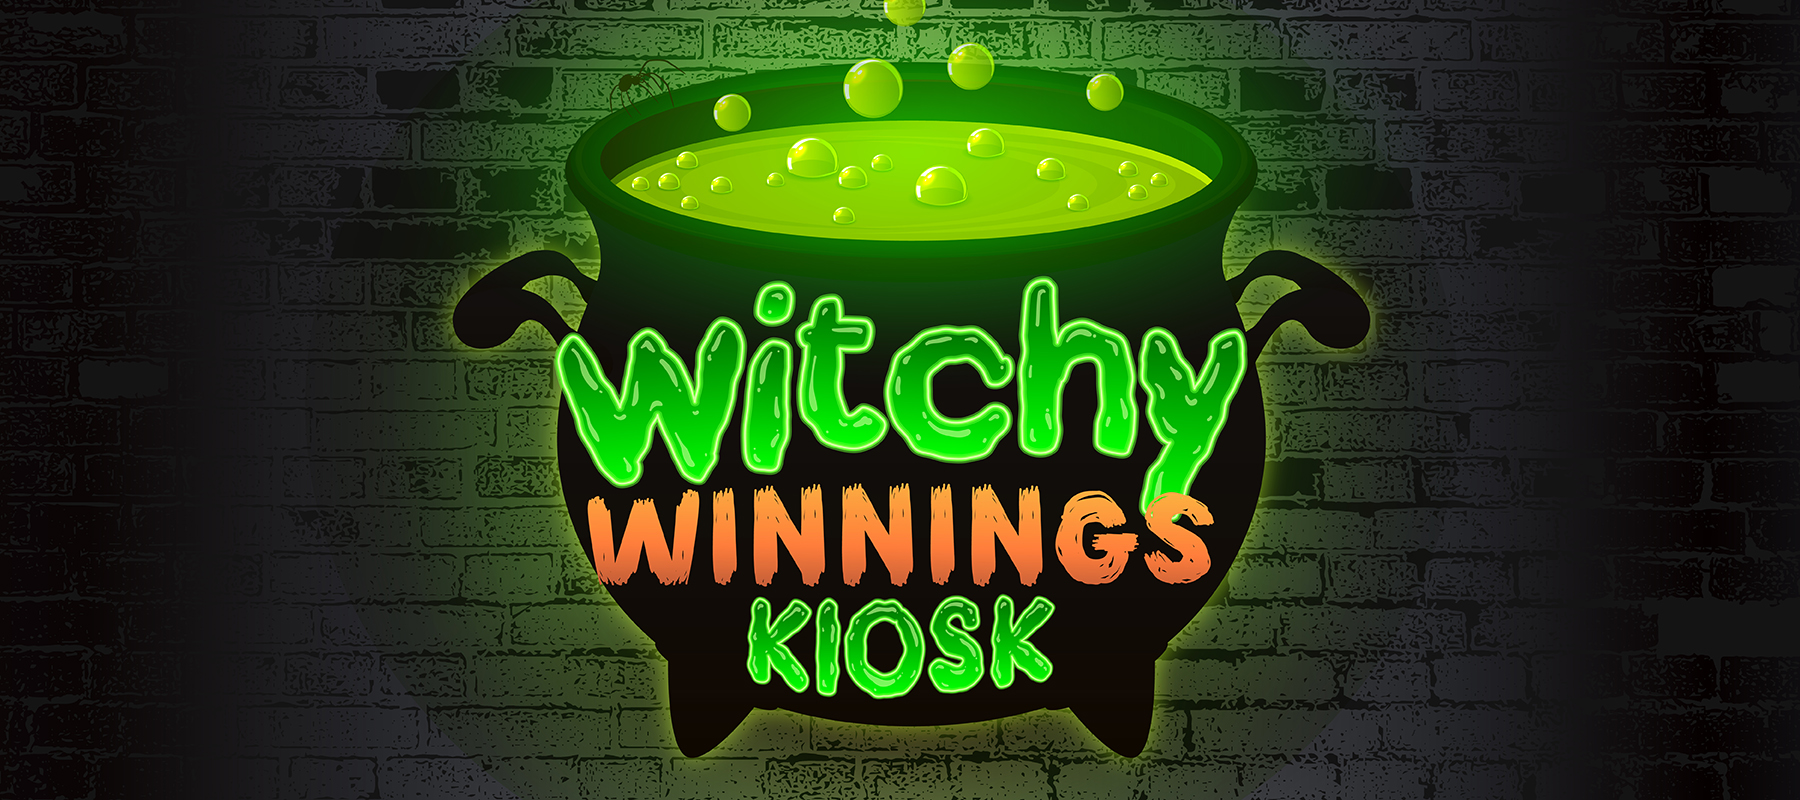 Witchy Winnings Kiosk